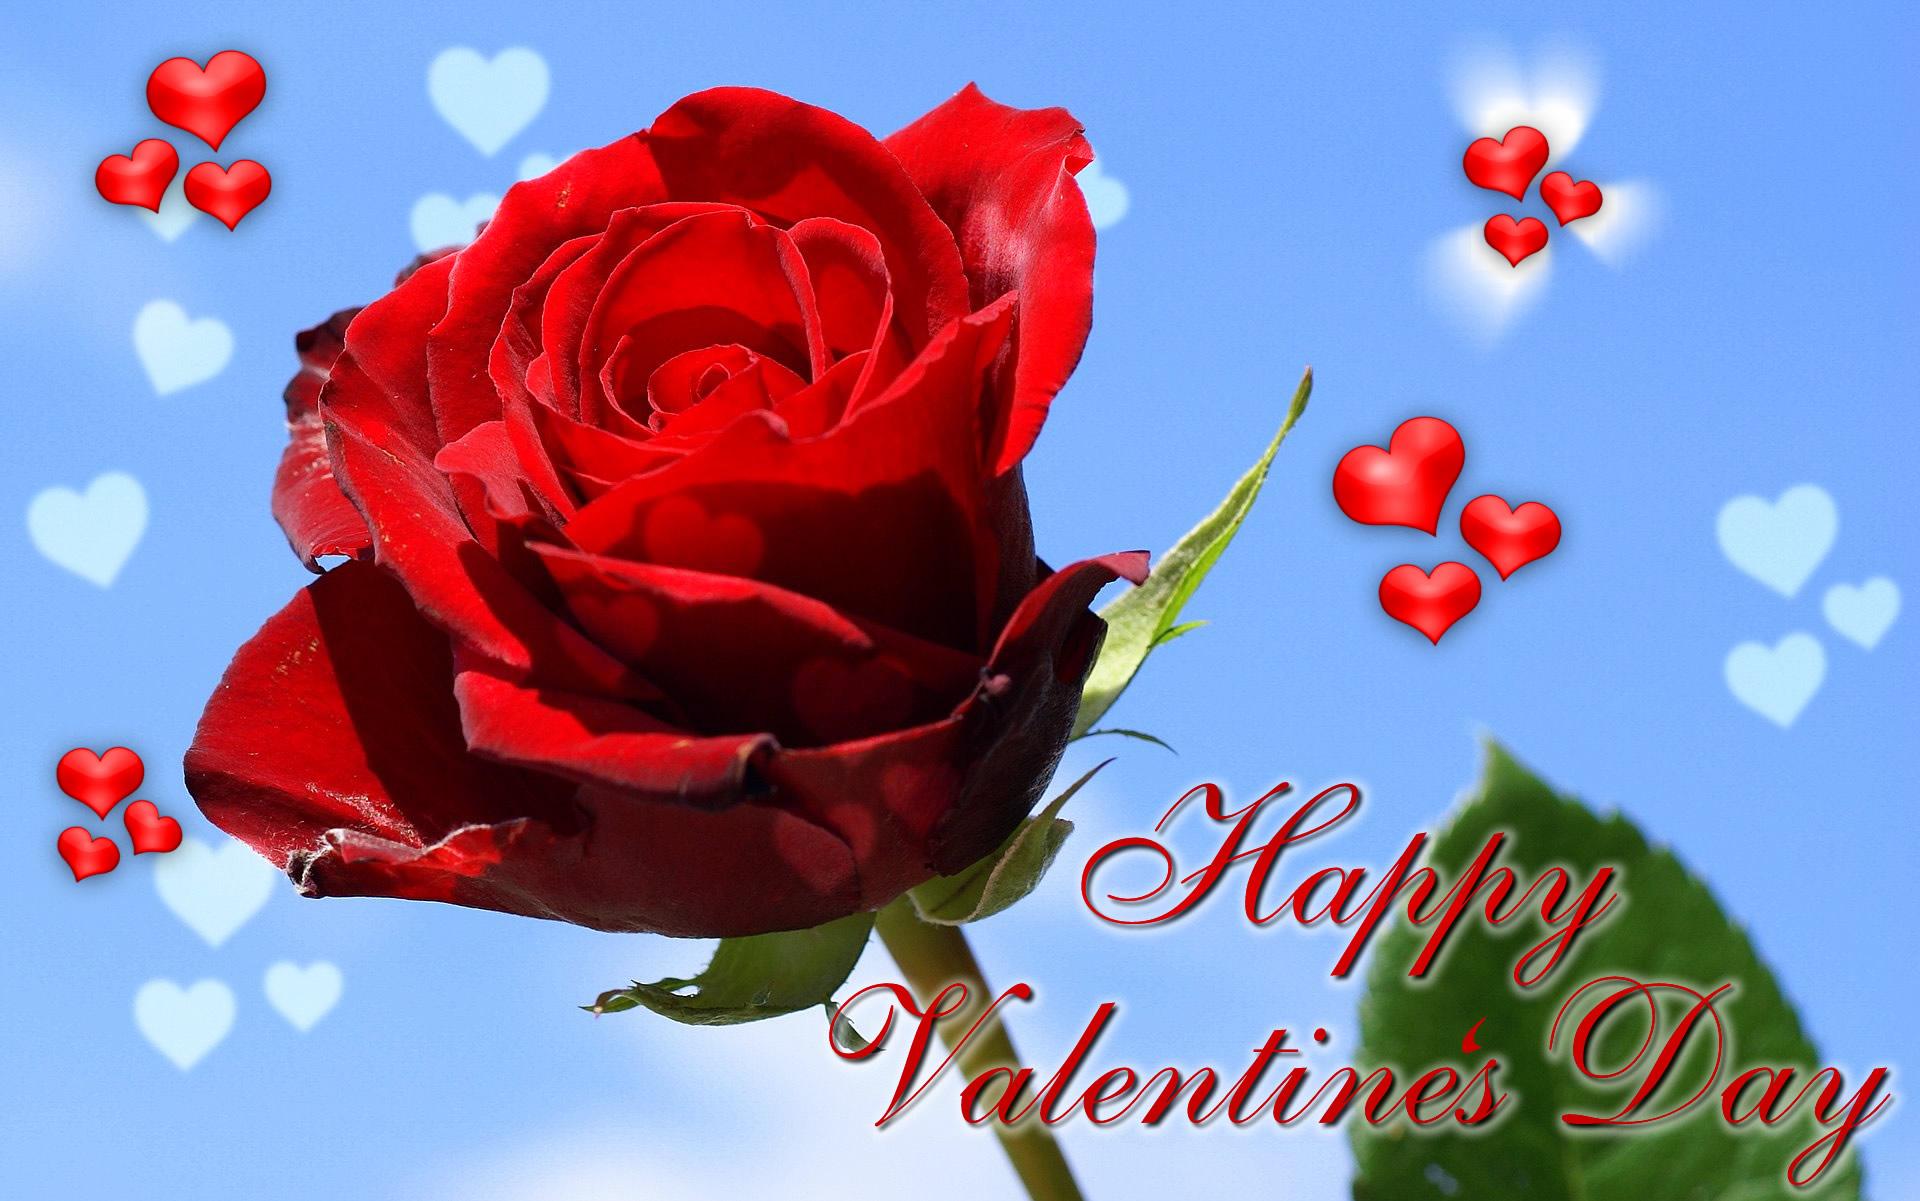 Saint Valentine's Day Happyvalentineday-ecard-wallpaper-9